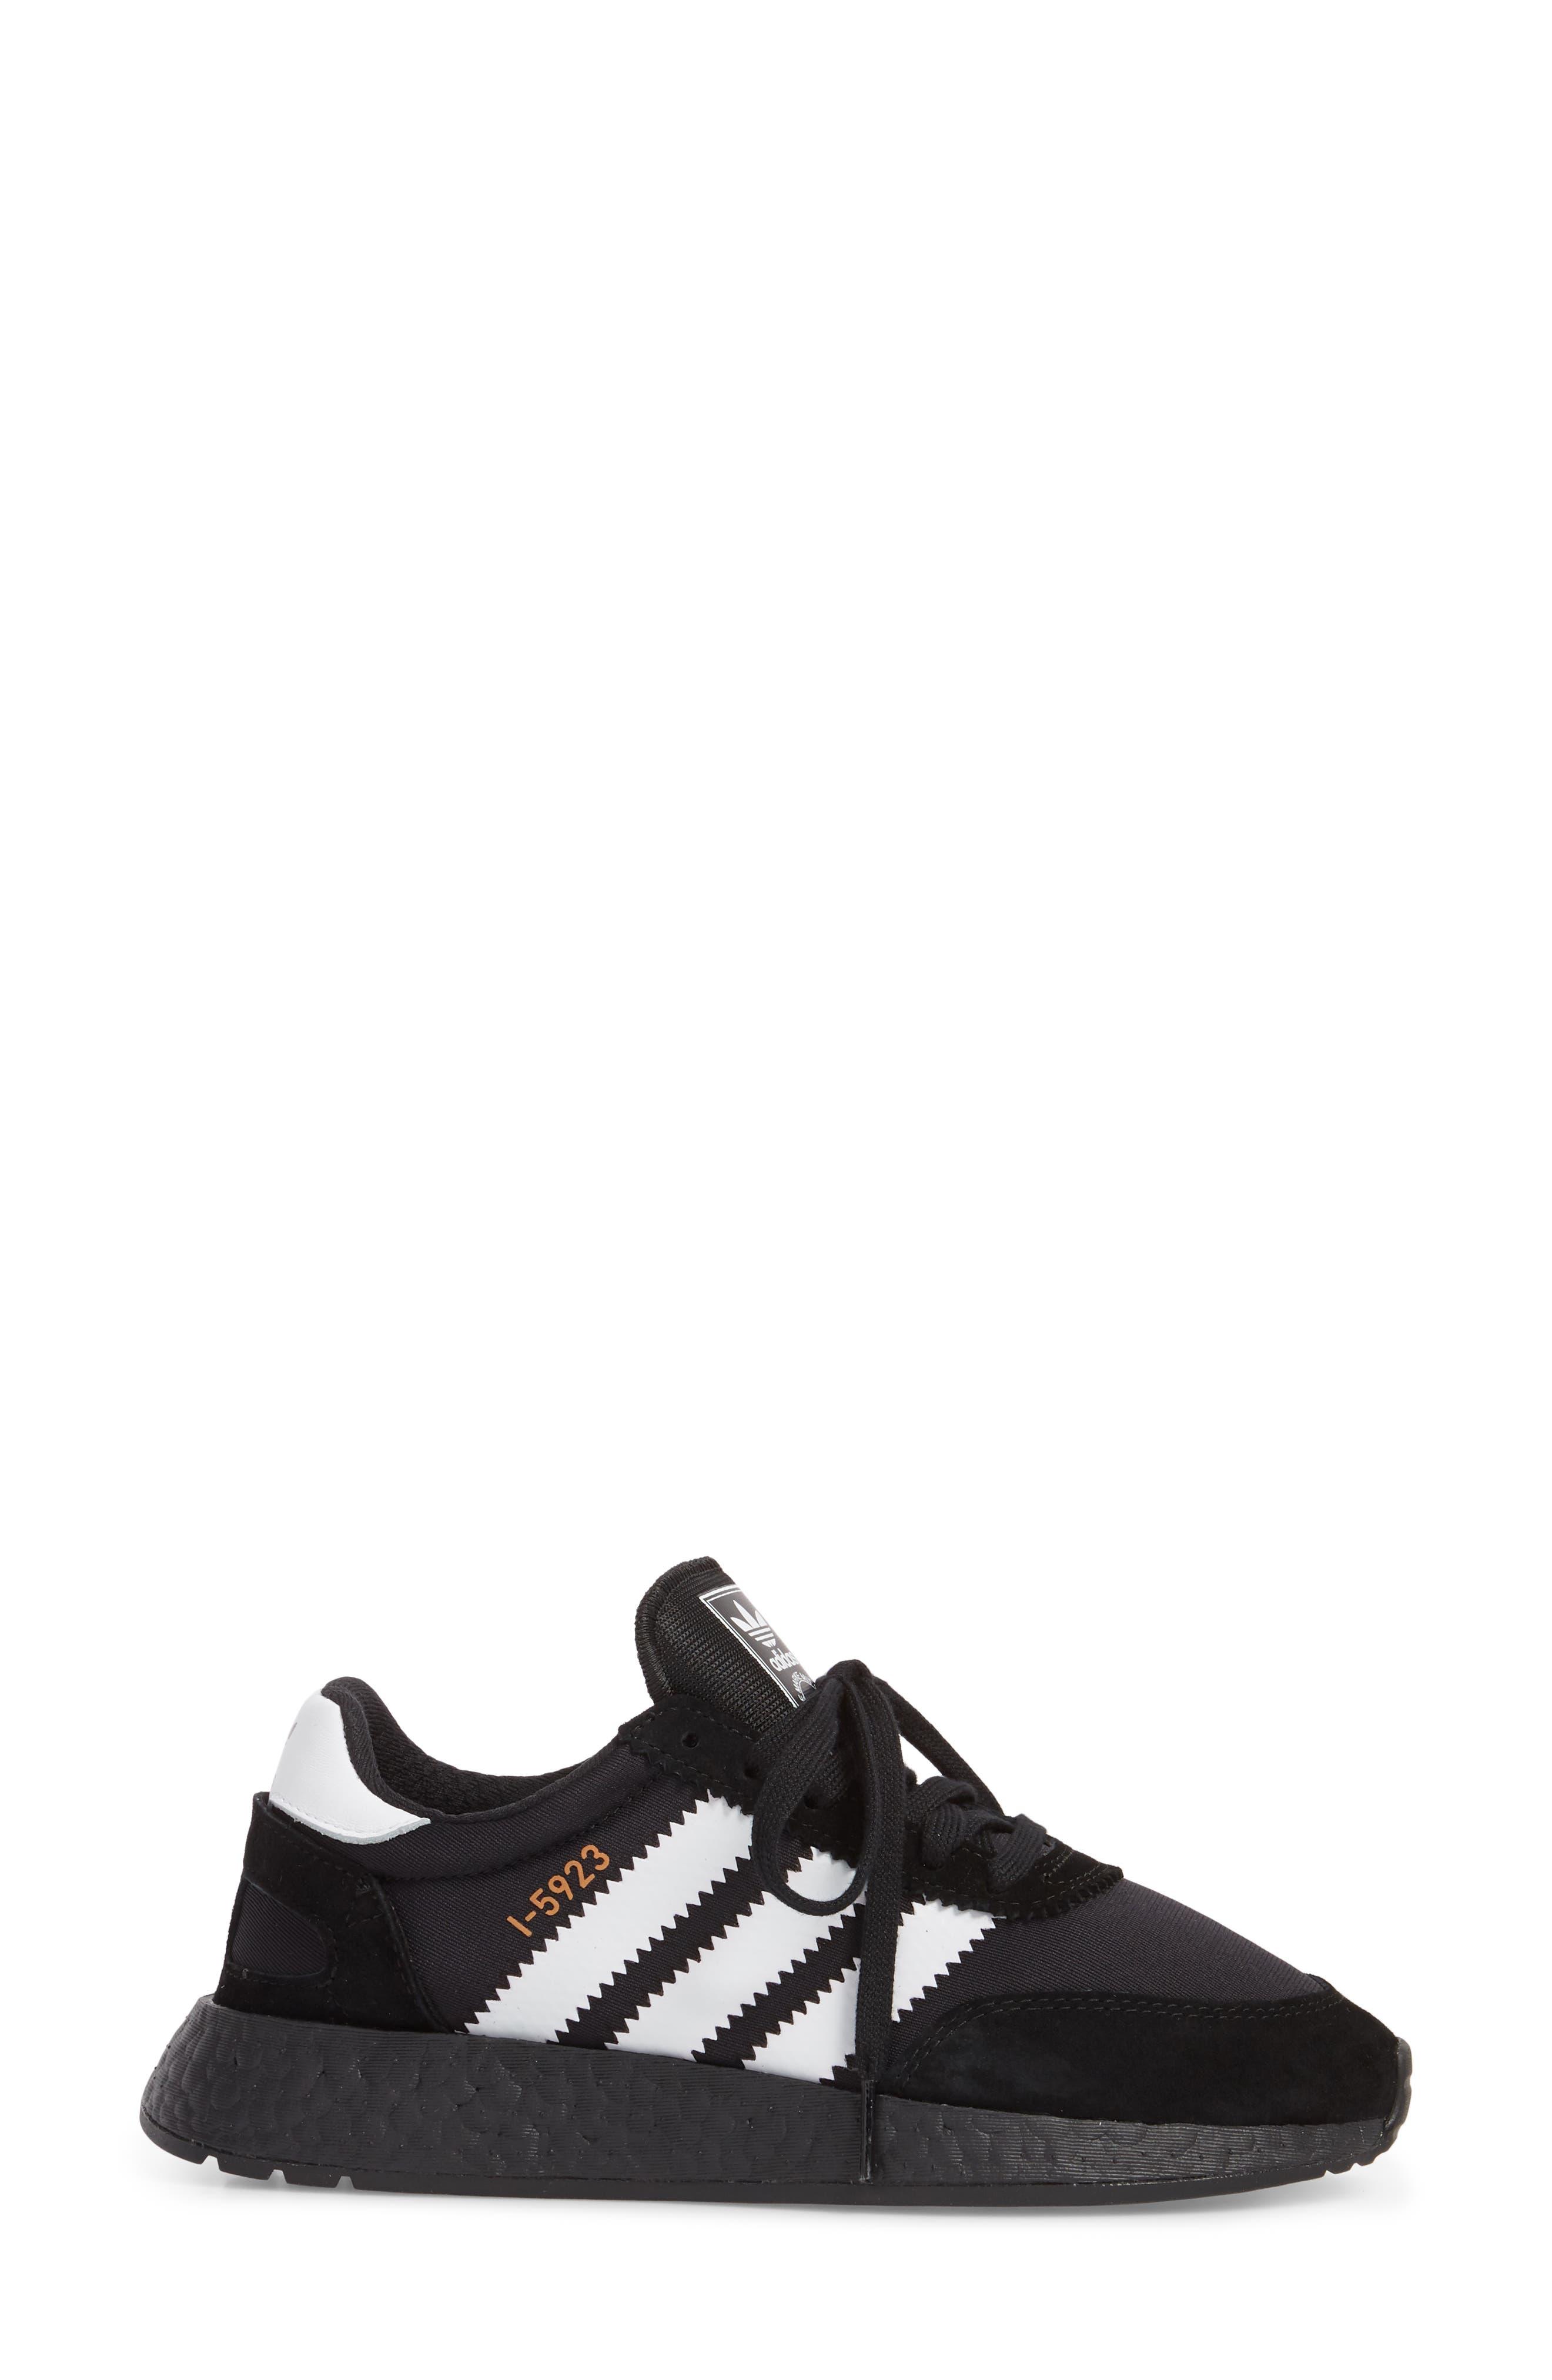 adidas originali - 5923 di scarpa, nucleo nero / bianco / rame.